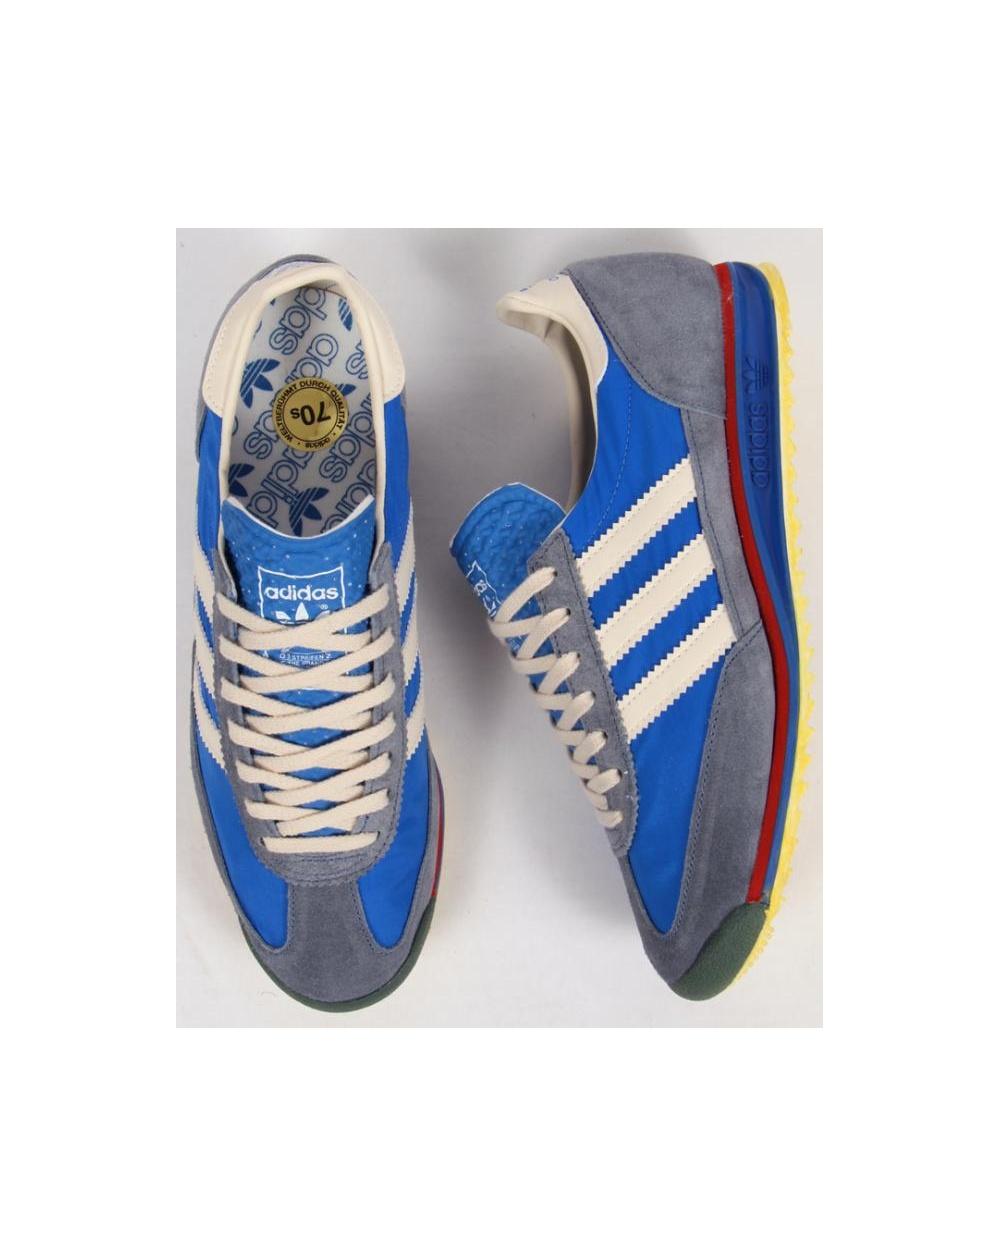 promo code 8be28 3331e Adidas Sl 72 Vin Trainers Royal Blue vintage Blue